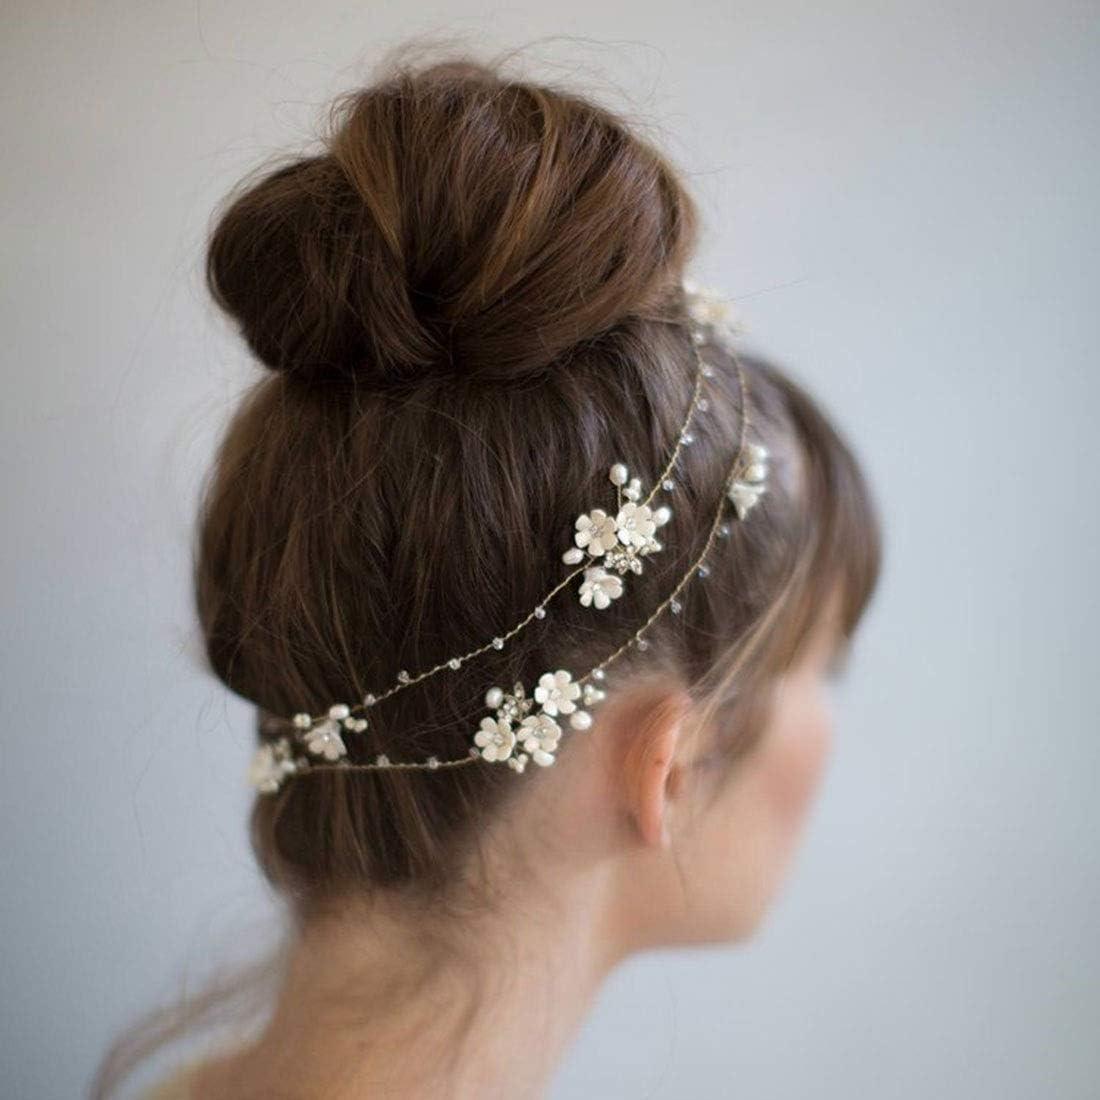 Wazenku 真珠の帽子白い花頭飾り結婚式のヘアアクセサリー結婚式のヘアバンド (色 : ホワイト)